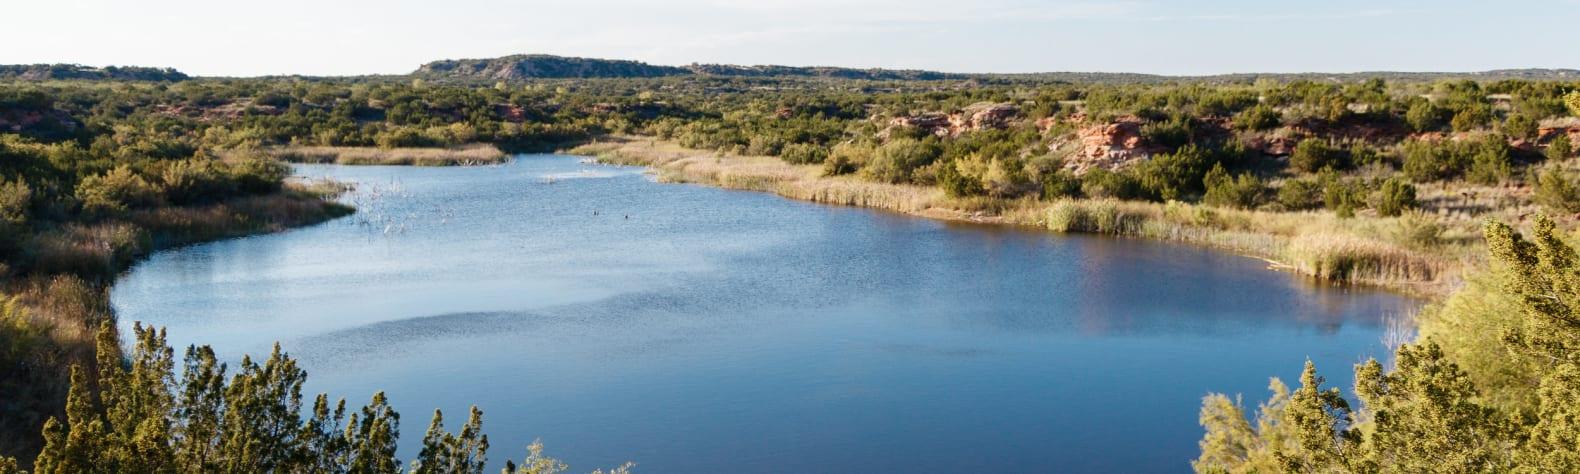 Copper Breaks State Park